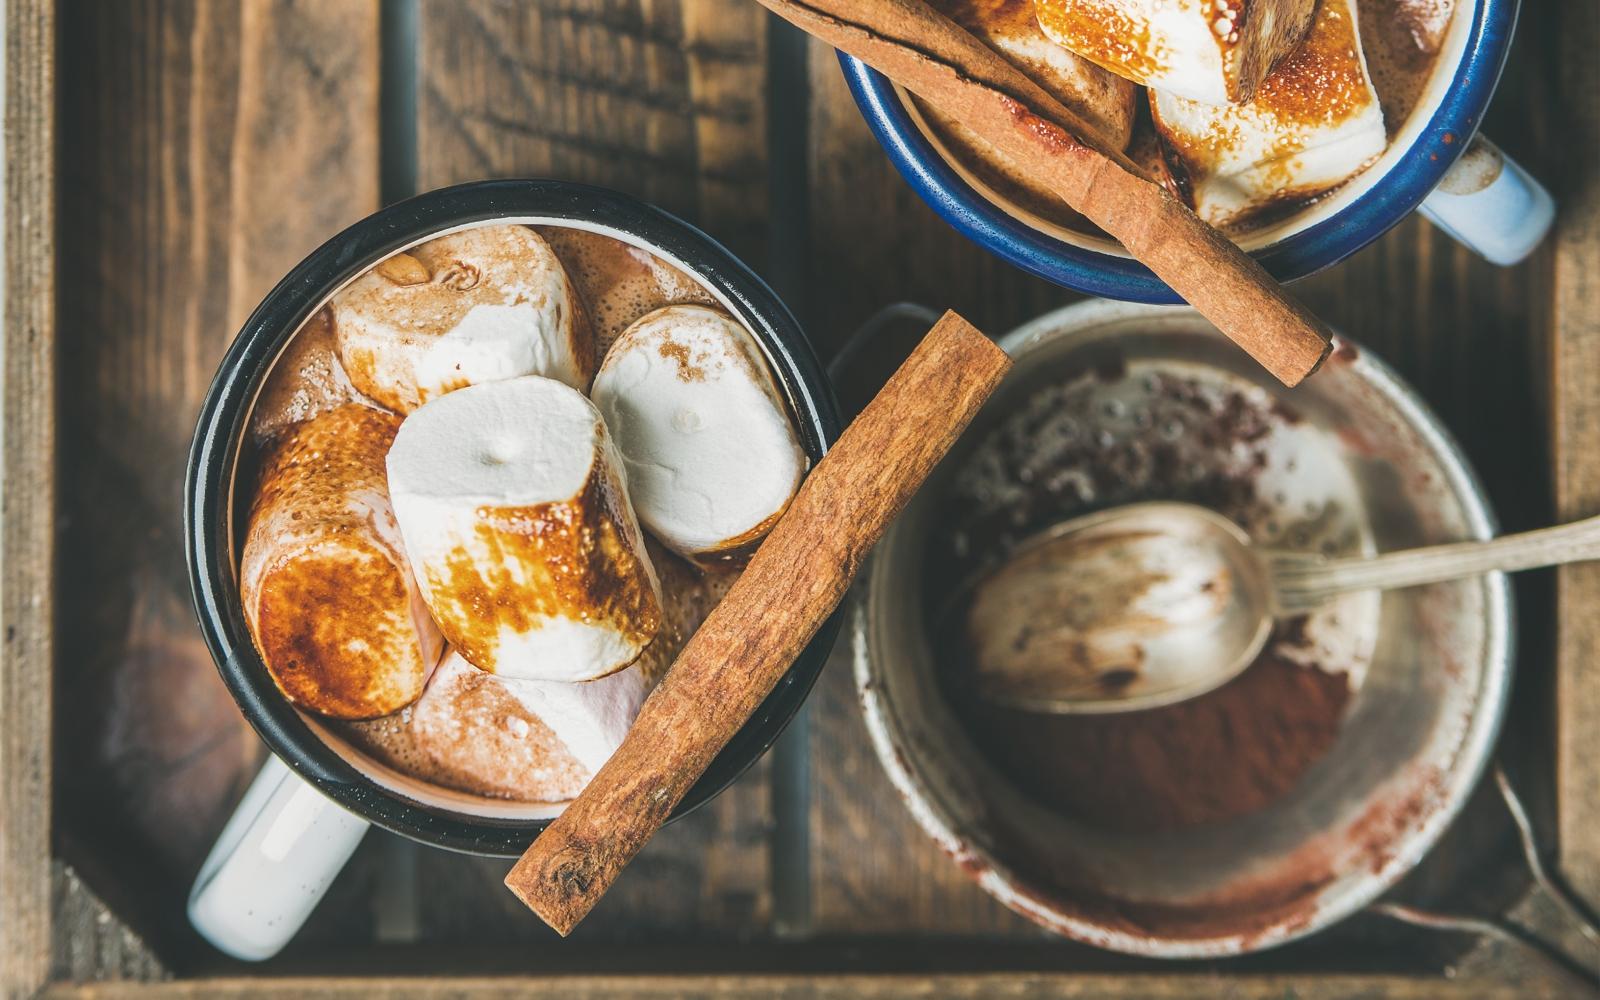 Vegan Hot Chocolate With Maca and Tonic Herbs